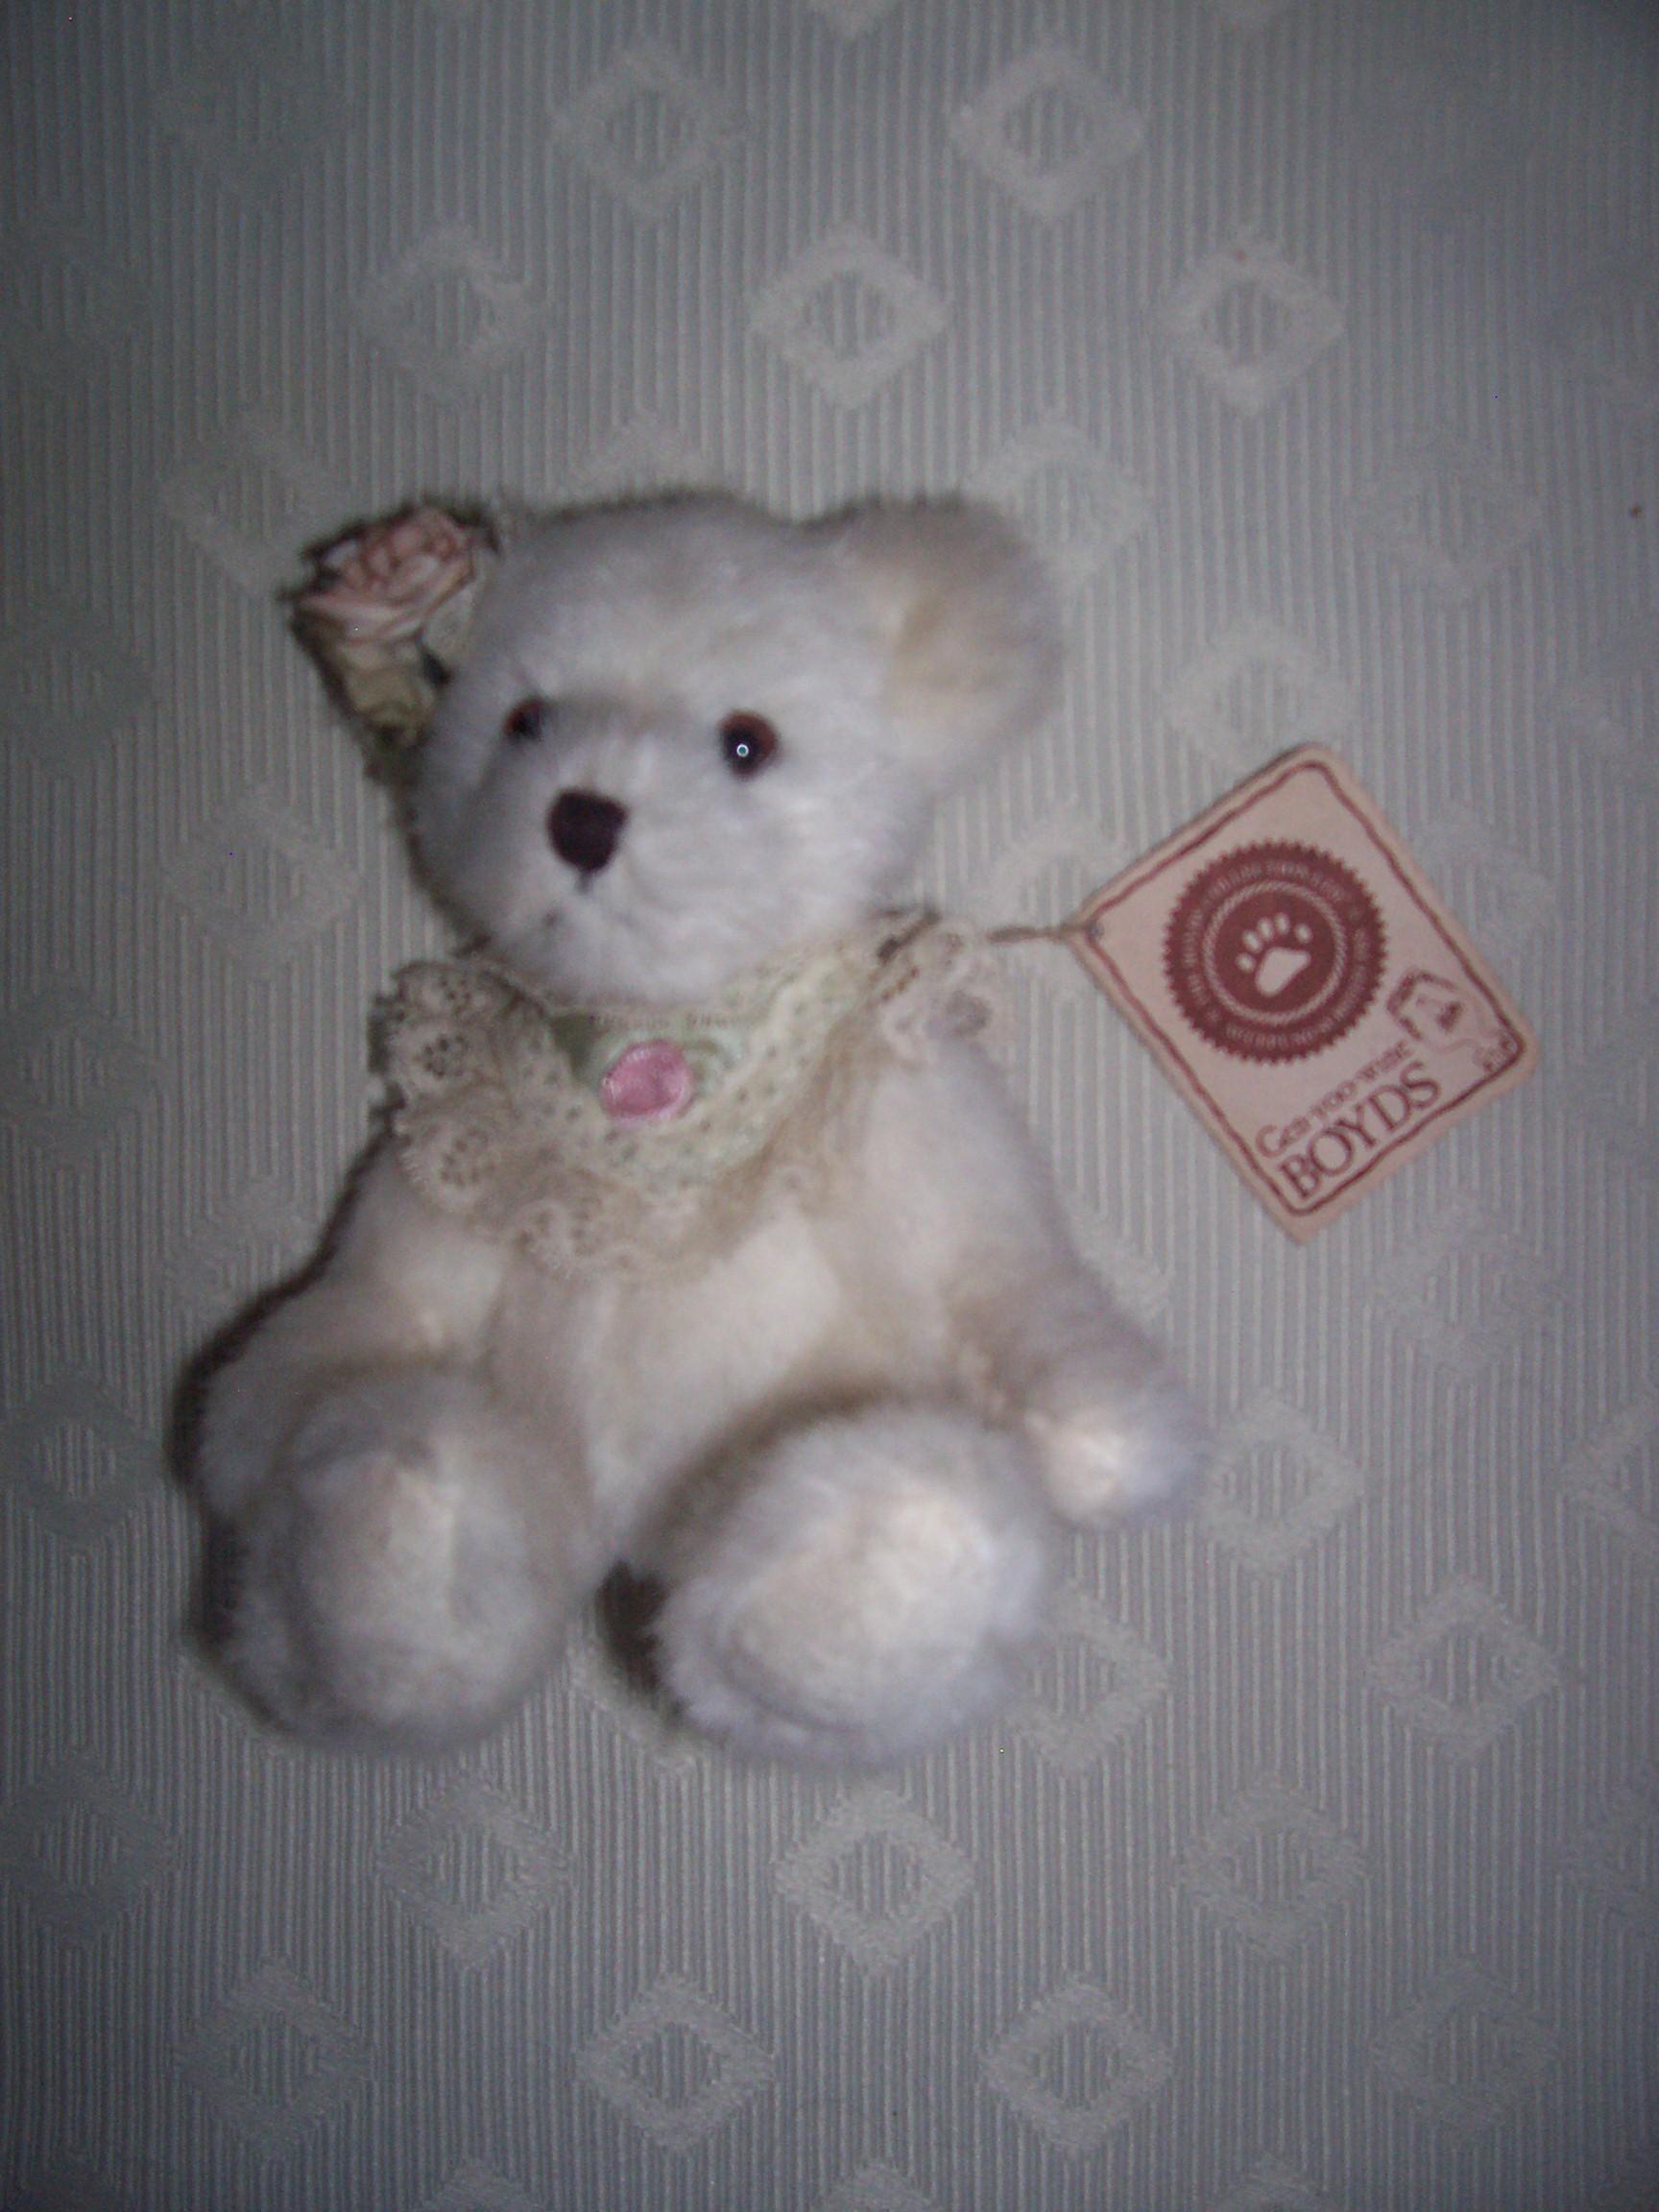 Boyds Bears Small White Bear